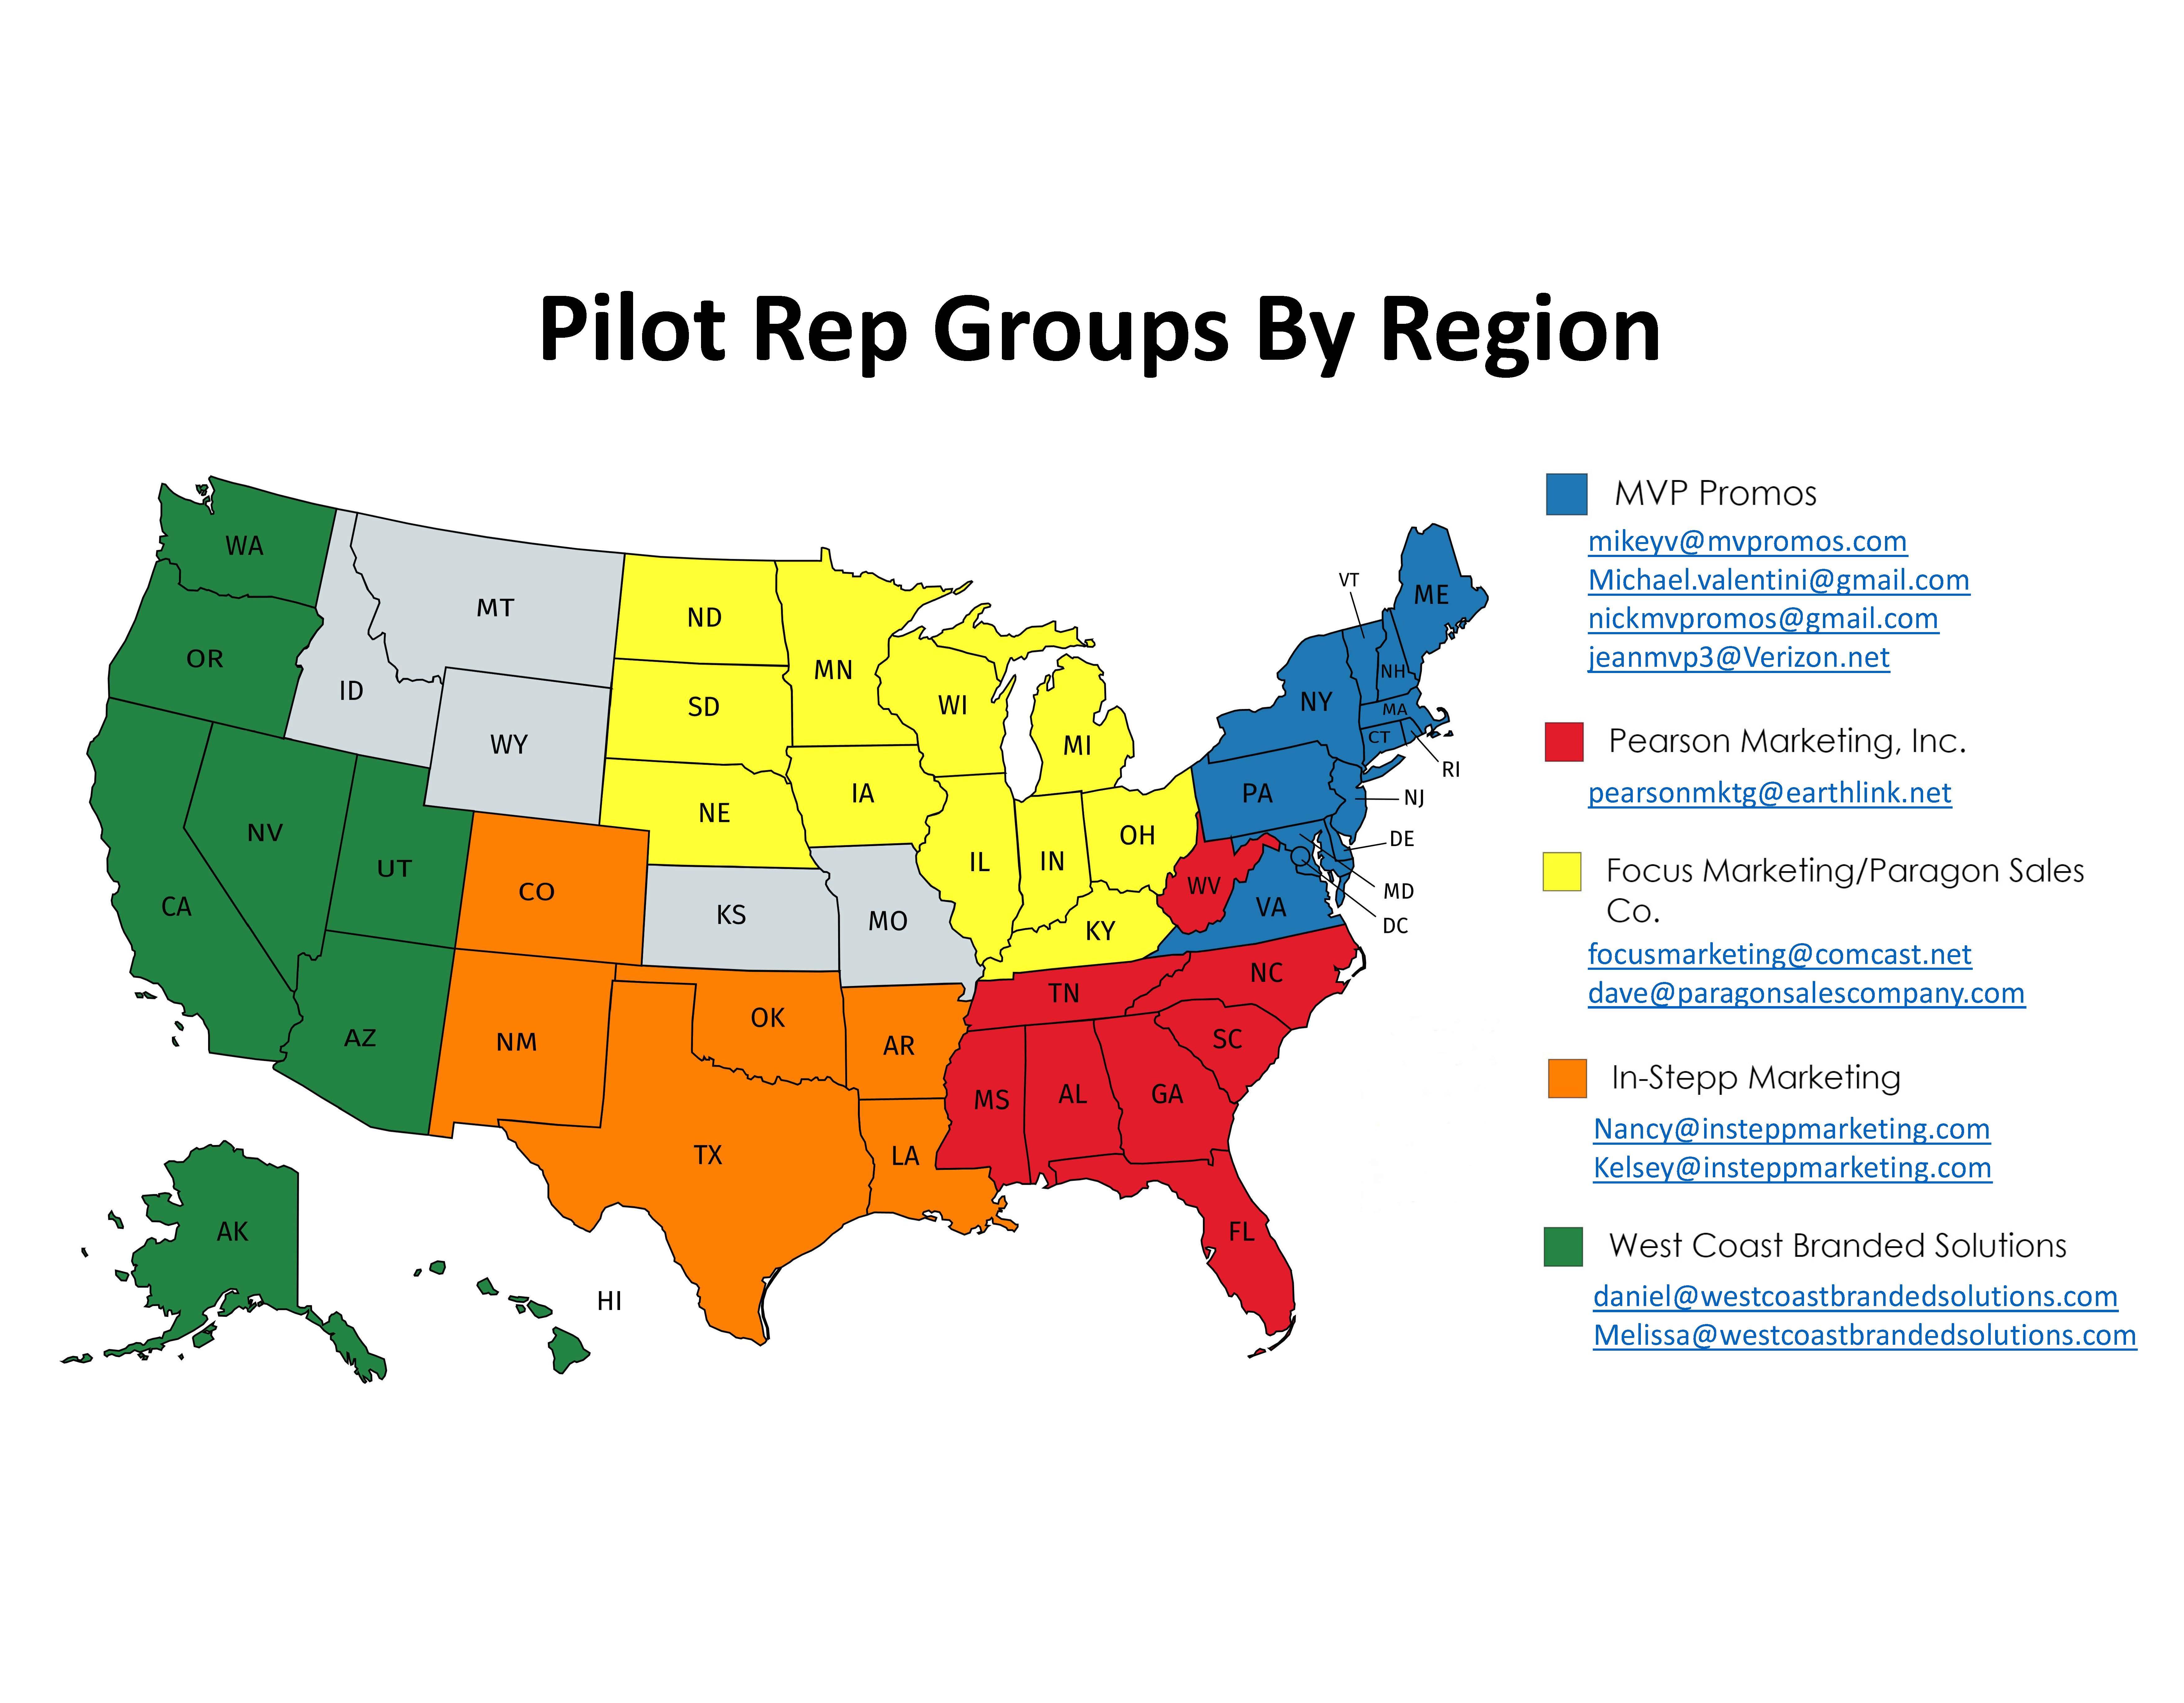 Pilot Rep Groups by Region 2018.jpg